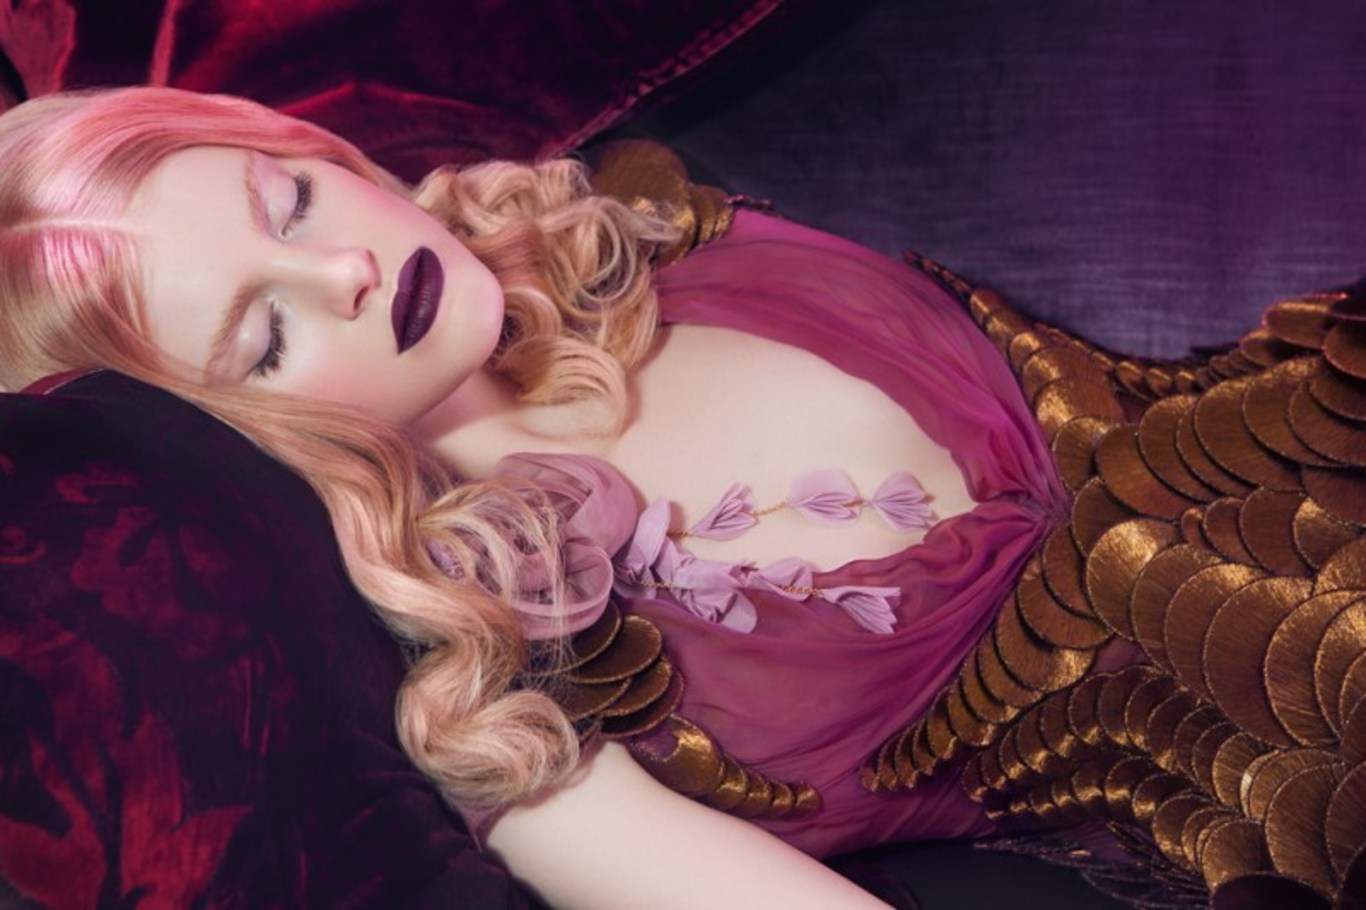 Игра Спящая красавица: макияж (Sleeping beauty makeover) 71